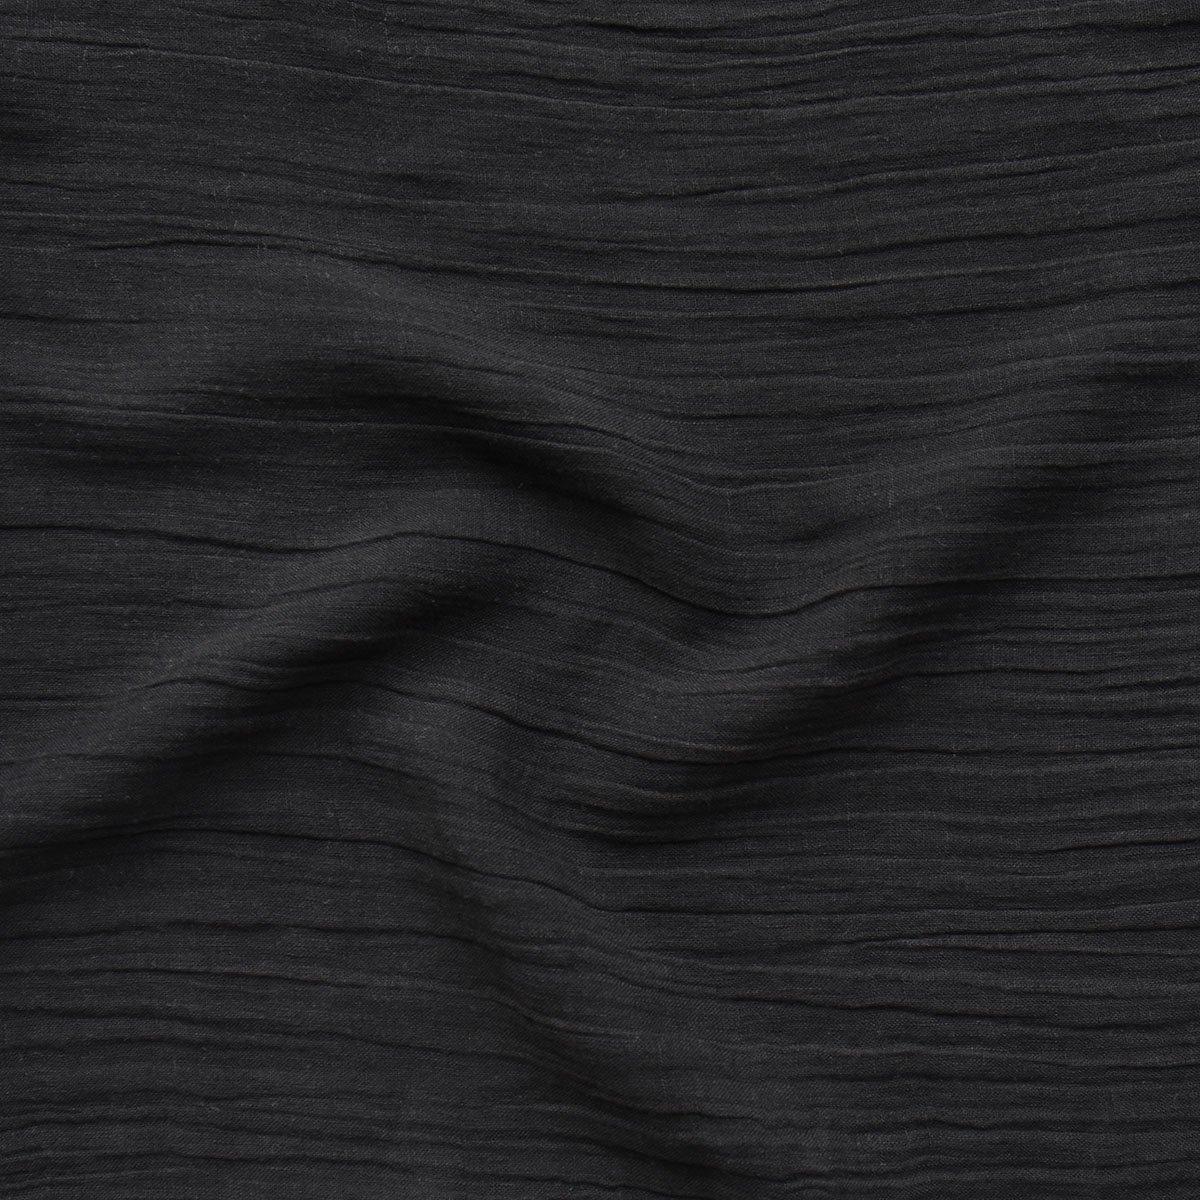 Linen Gauze - Black